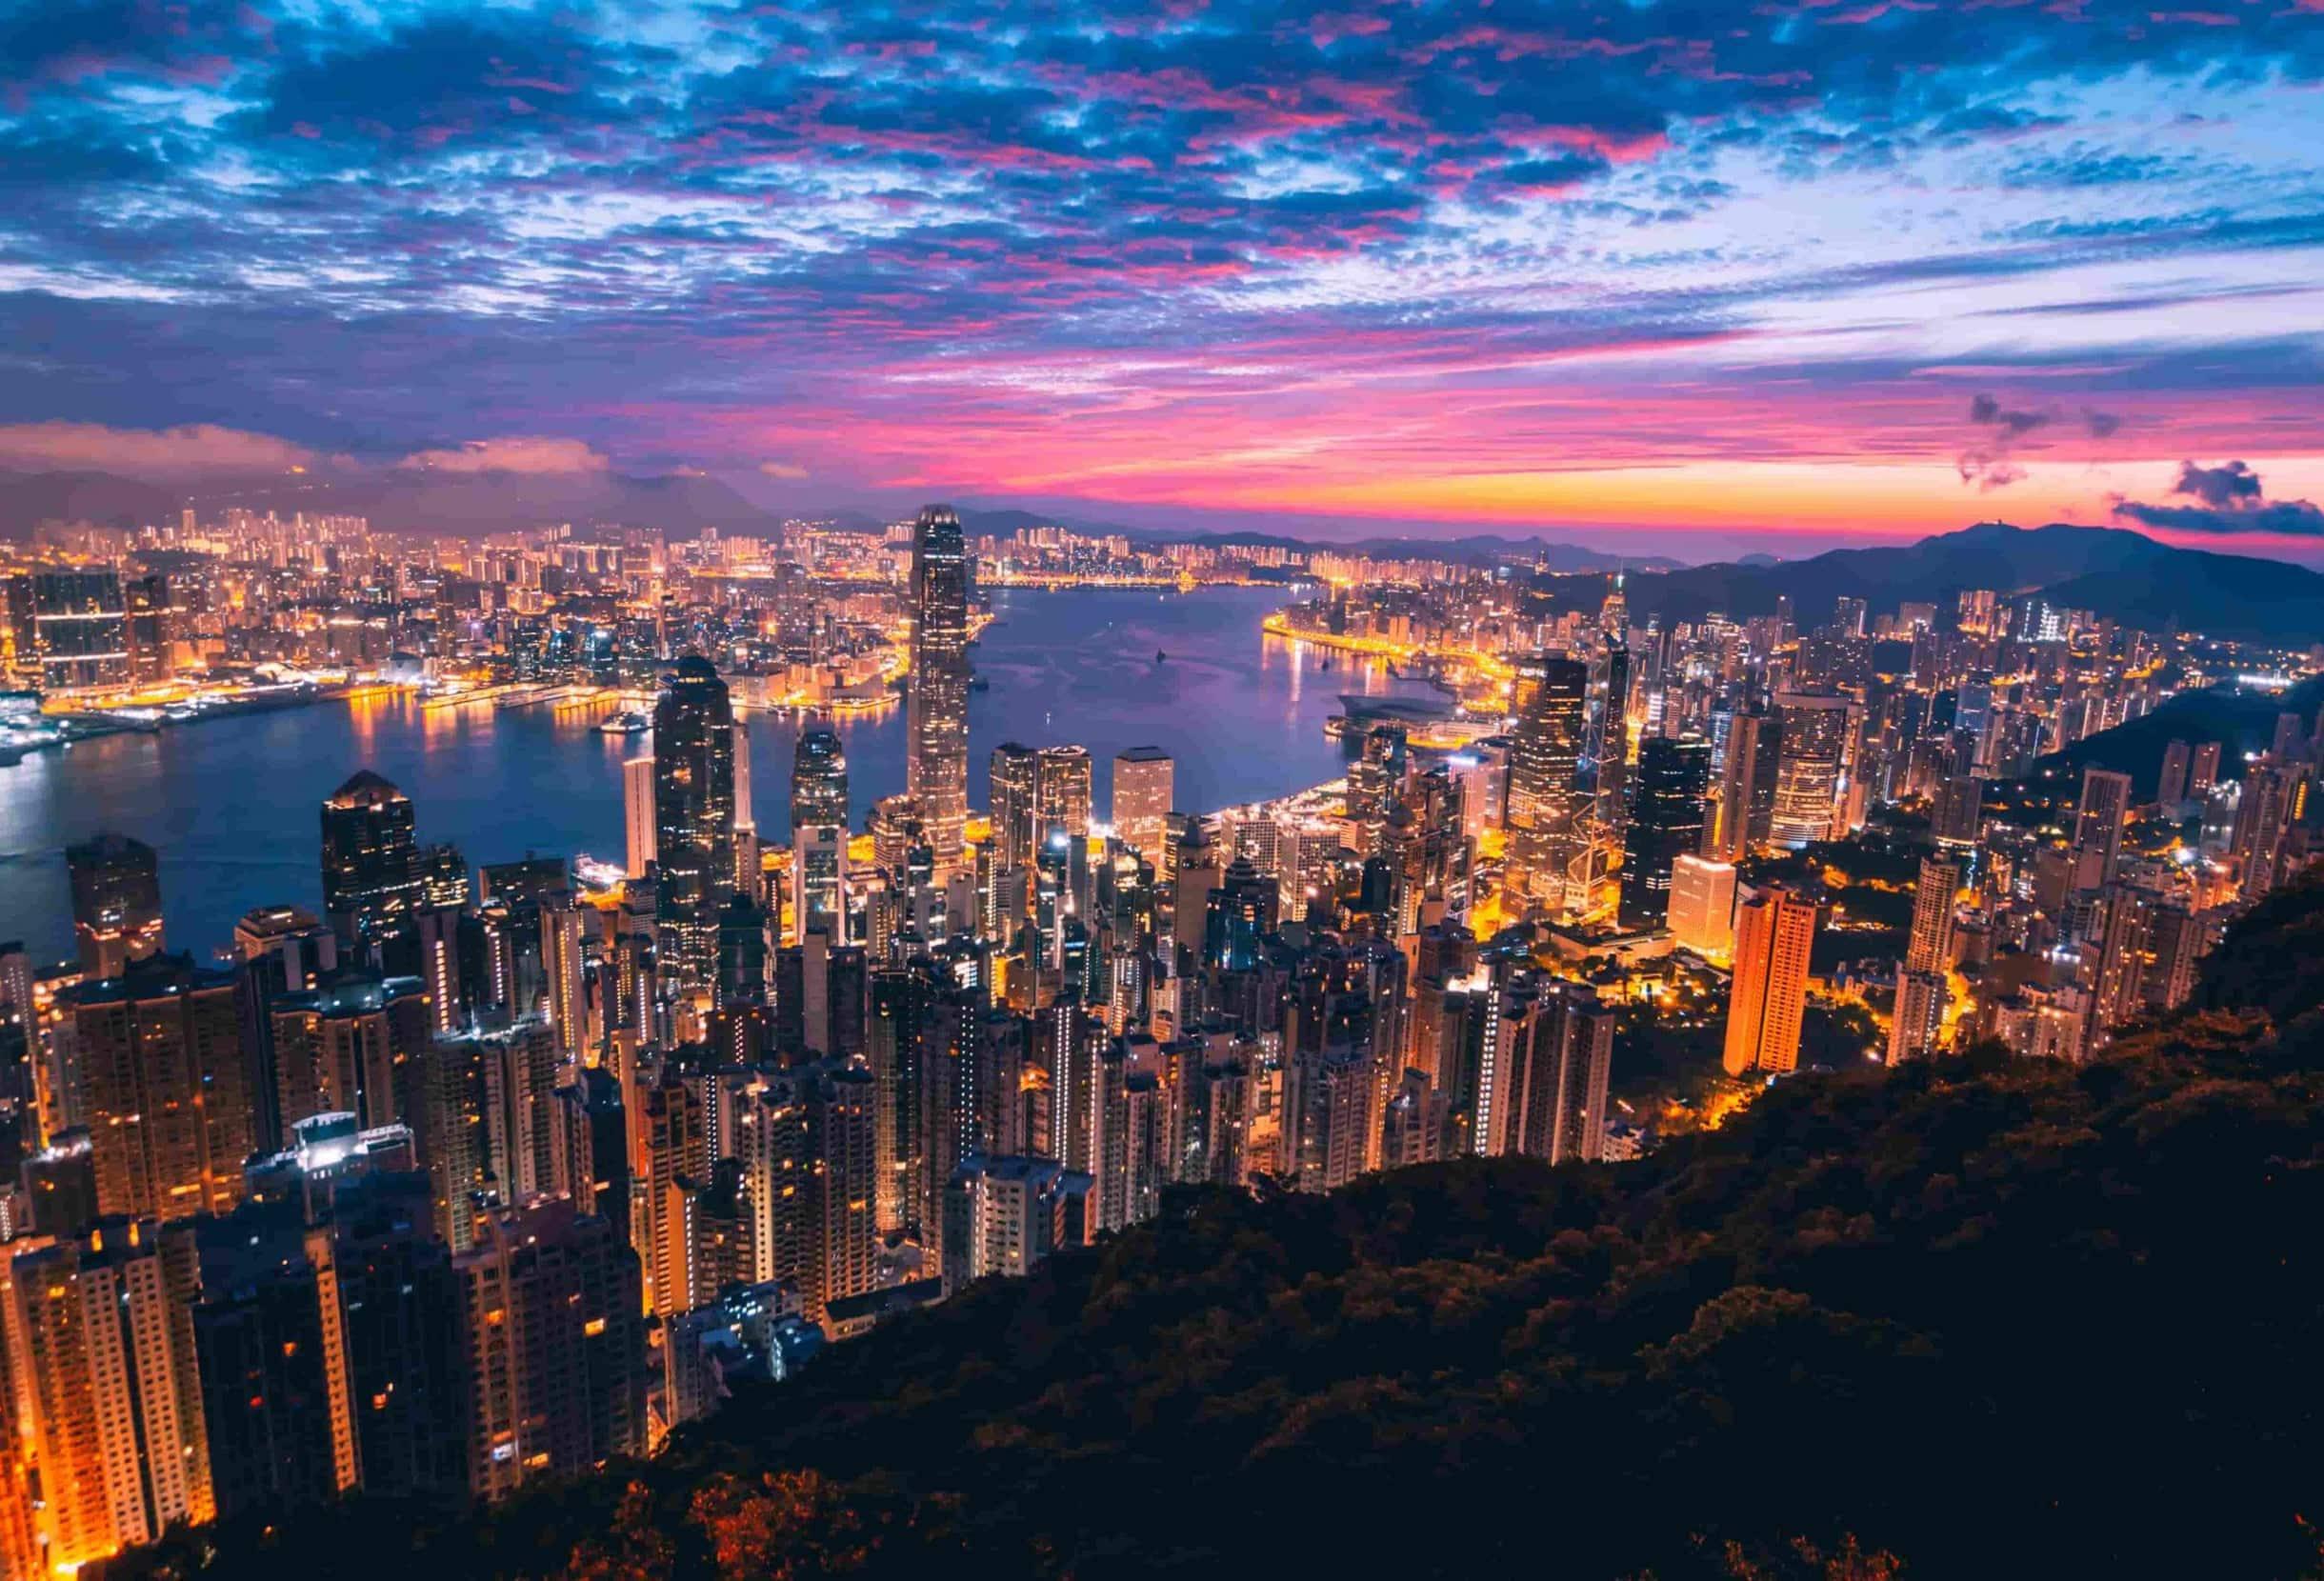 Quel est le nom d'un résident de Hong Kong?